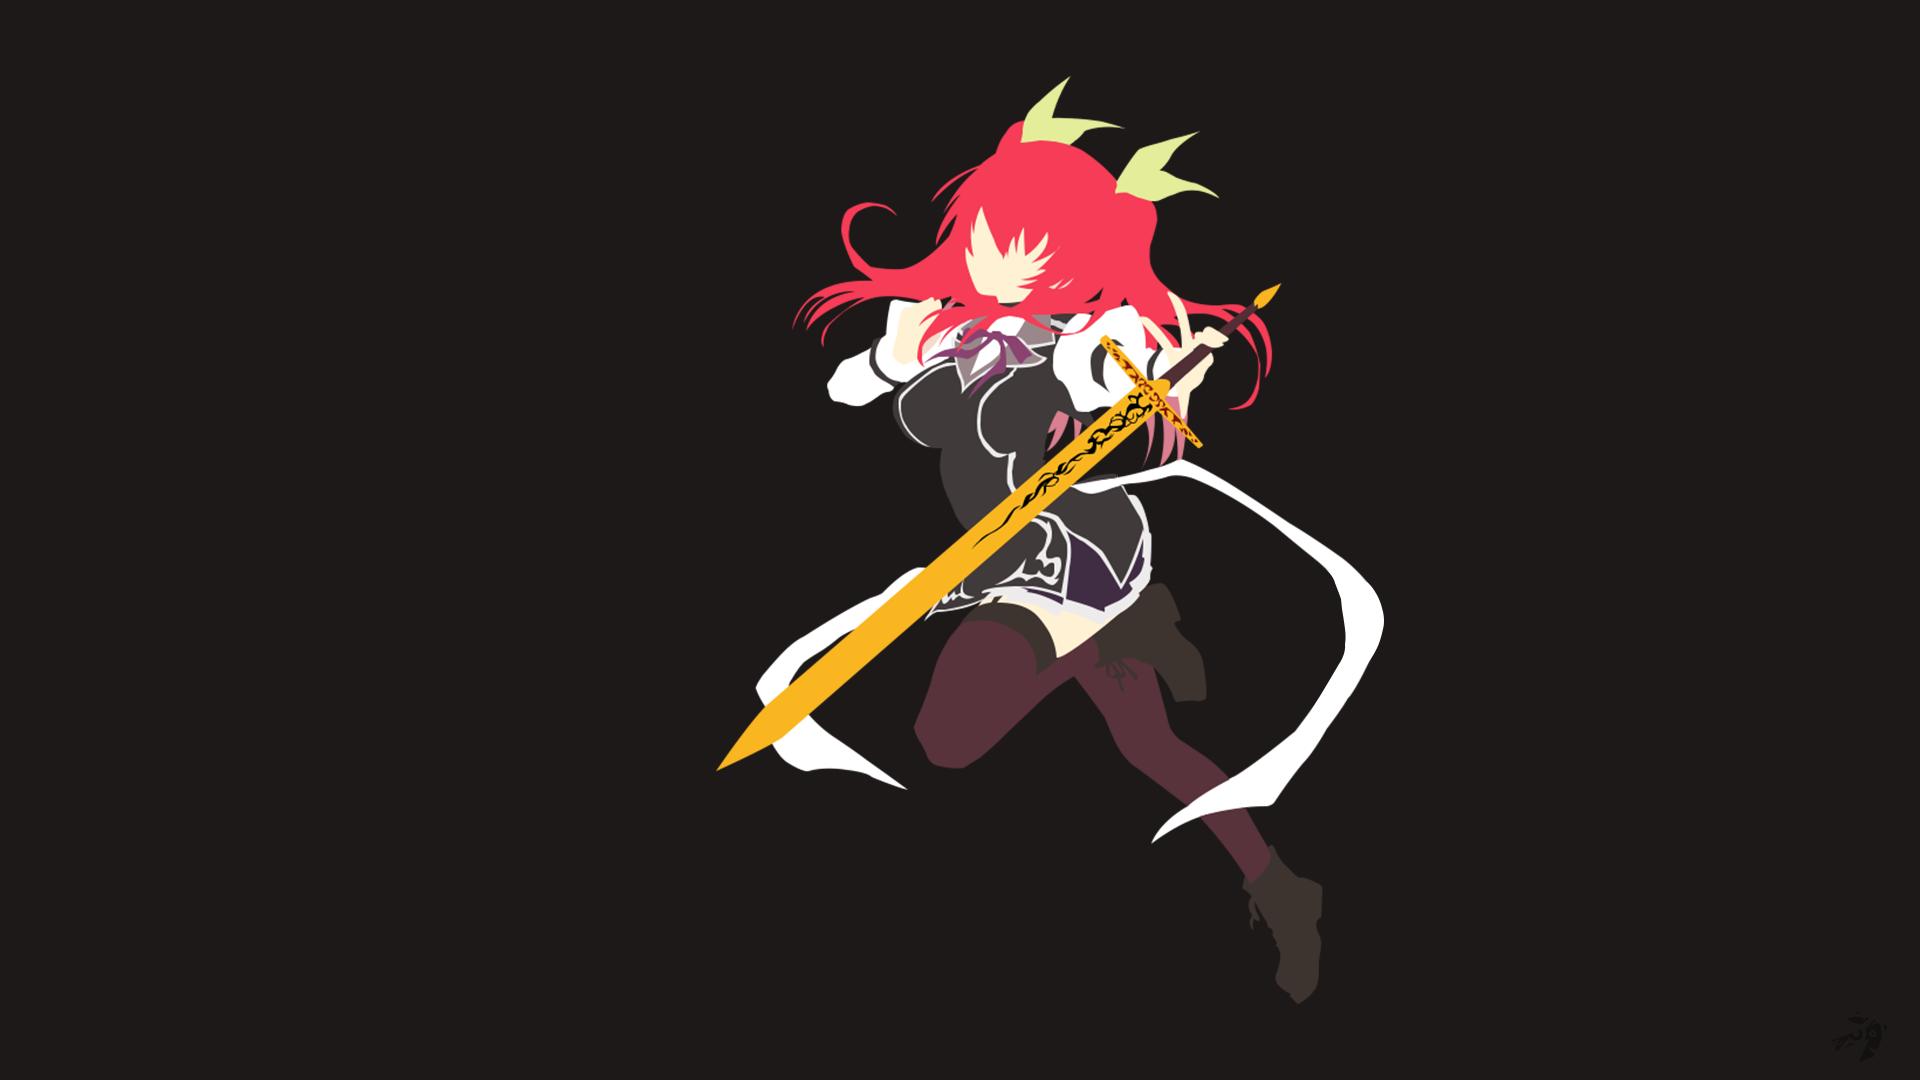 Wallpaper Illustration Anime Girls Cartoon Anime